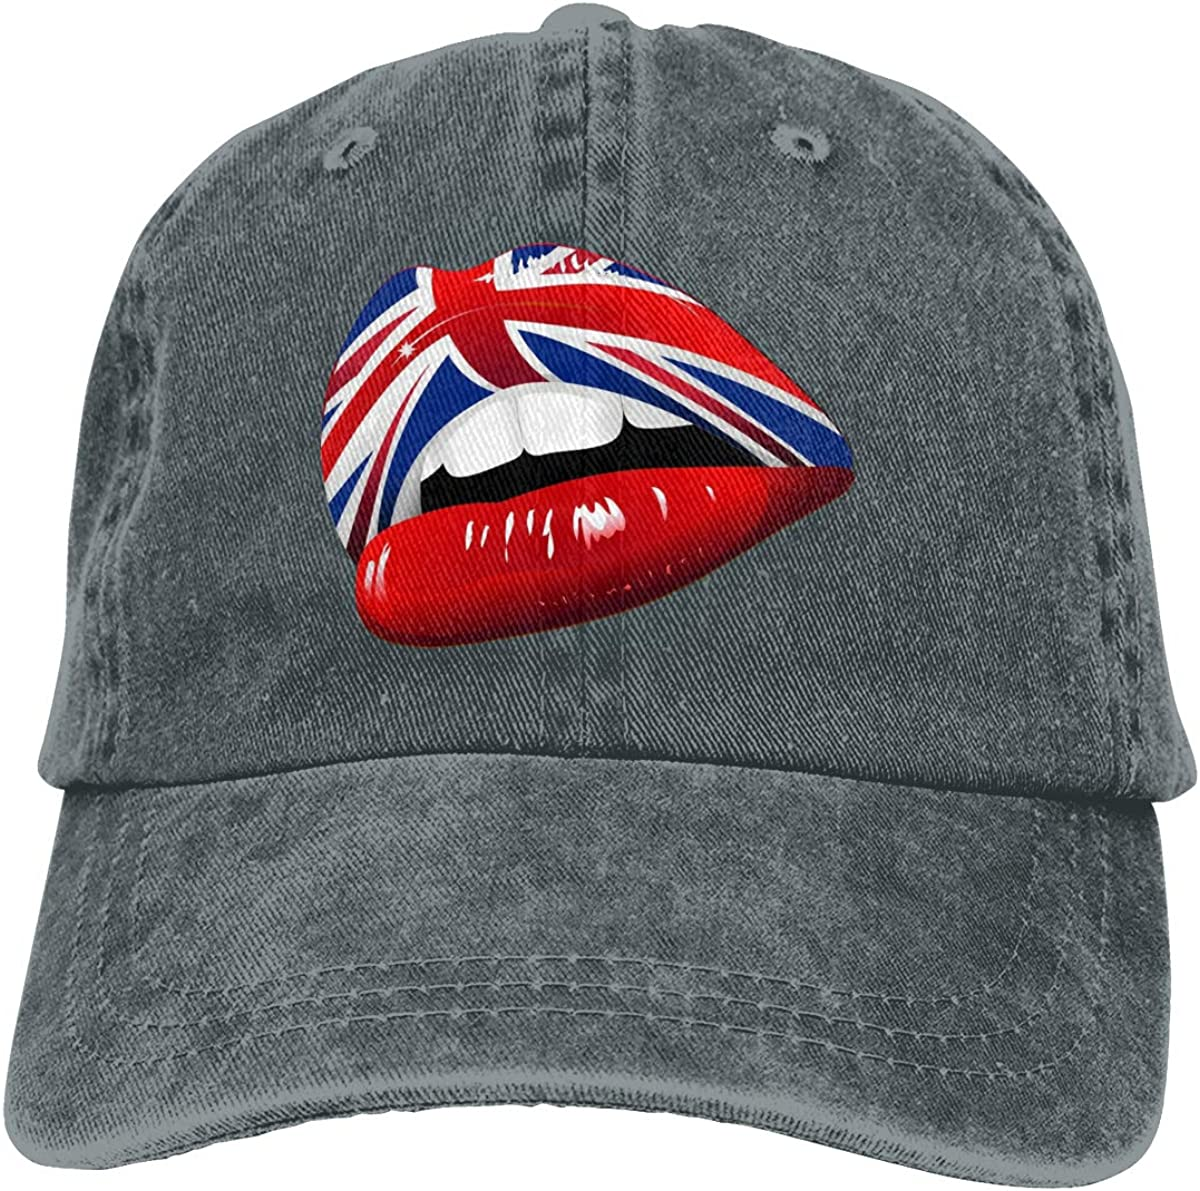 GAOFEIhat Labbra Sensuali Inghilterra-UK England Flag Sensual Lips Unisex Adult Denim Hats Cowboy Hat Dad Hat Driver Cap